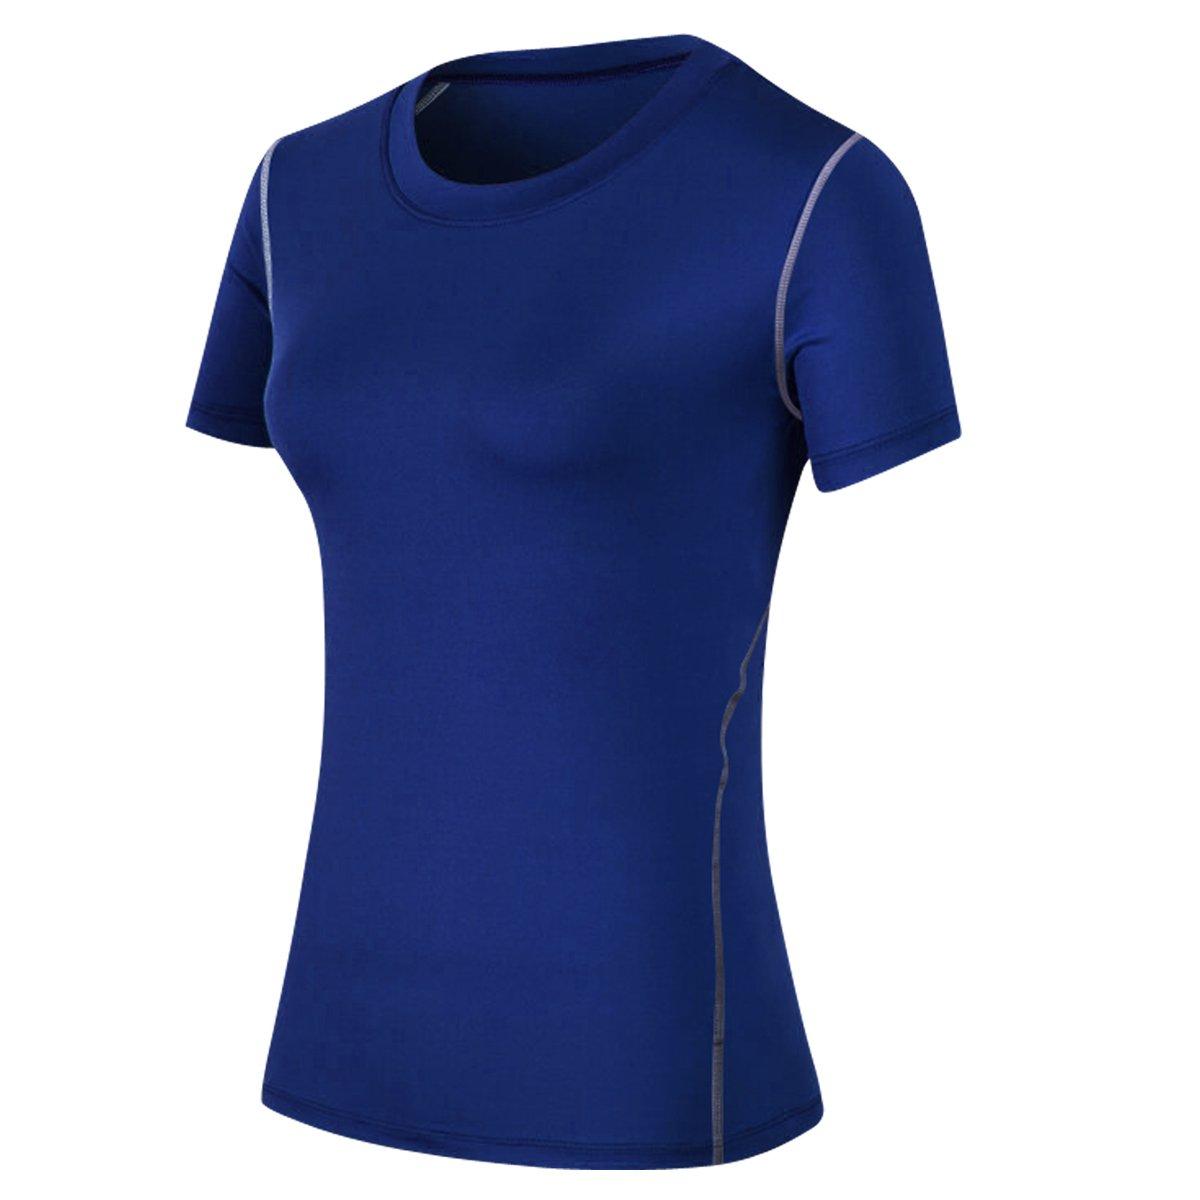 fitnestyleレディース圧縮ワークアウトアスレチックシャツQuicky Dry Tシャツfor RunningヨガTrainning Tag L/US M(Height:5.2-5.4' Weight:101-122 lbs) ネイビー B07DLB658X